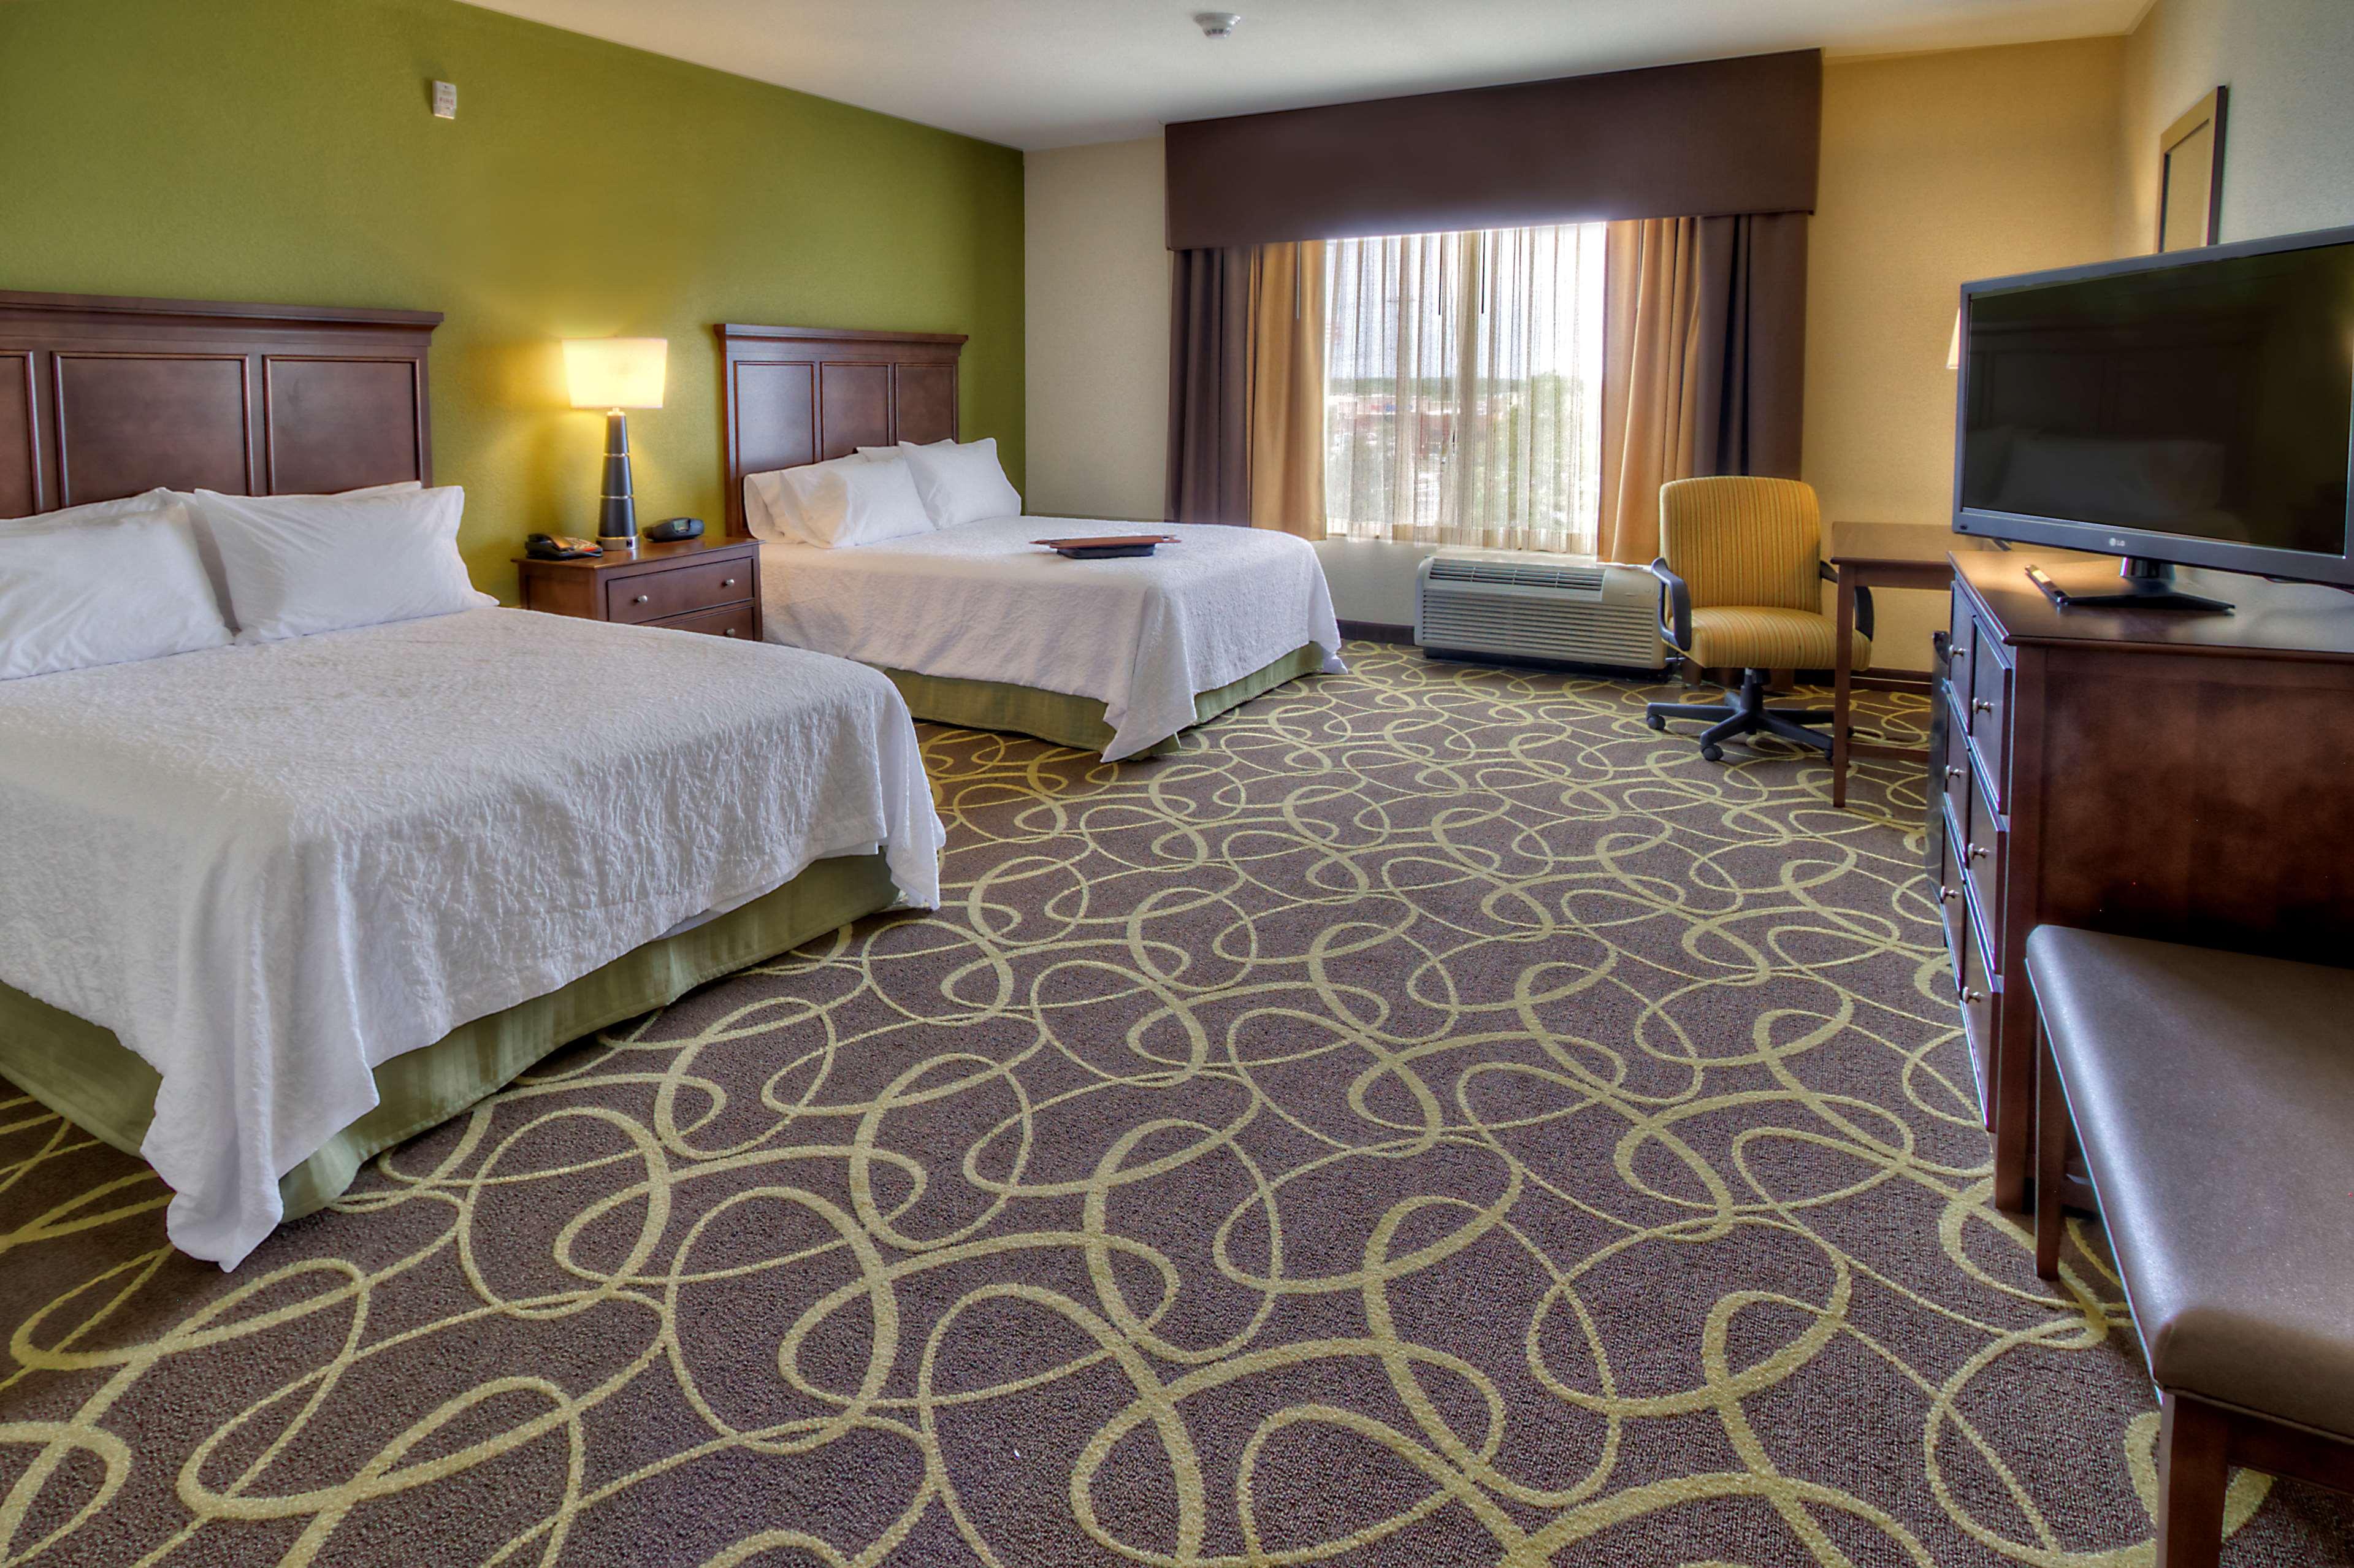 Hampton Inn & Suites Rochester/Henrietta image 24